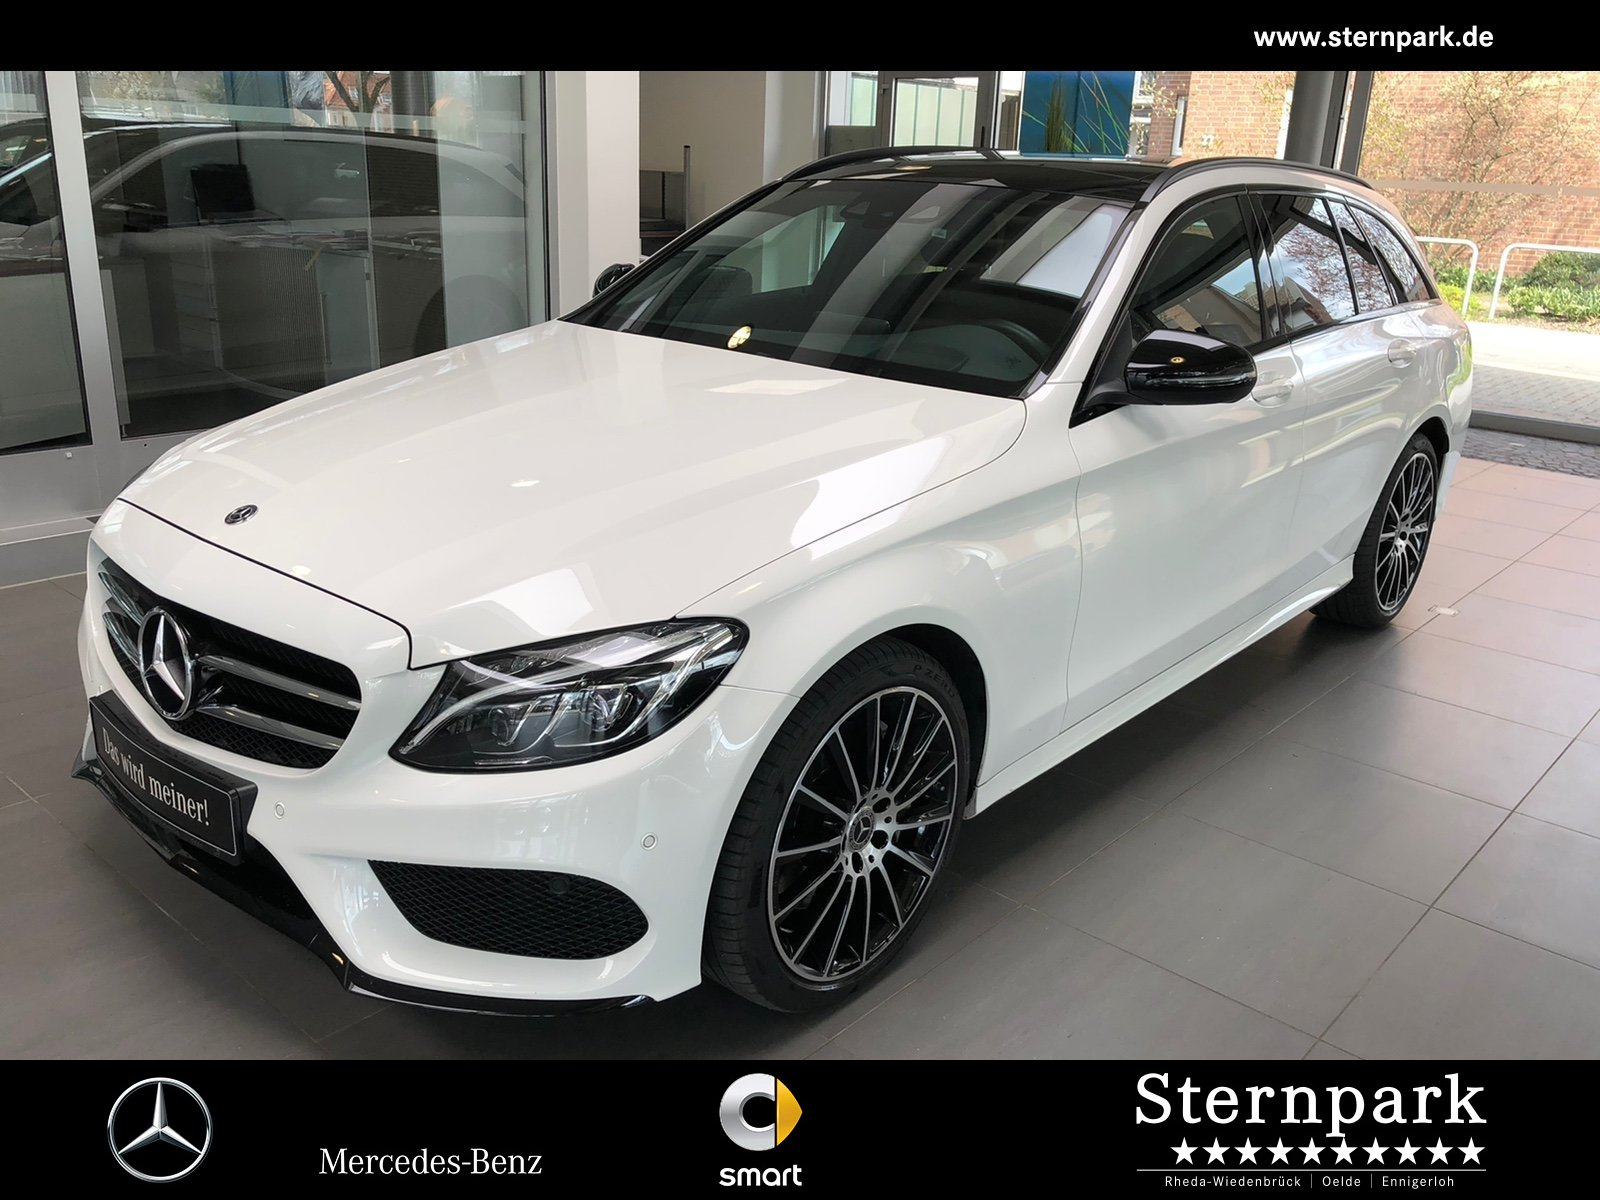 Mercedes-Benz C 400 4M T AMG Pano*HeadUp*Comand*AHK*MULTIBEAM, Jahr 2018, Benzin